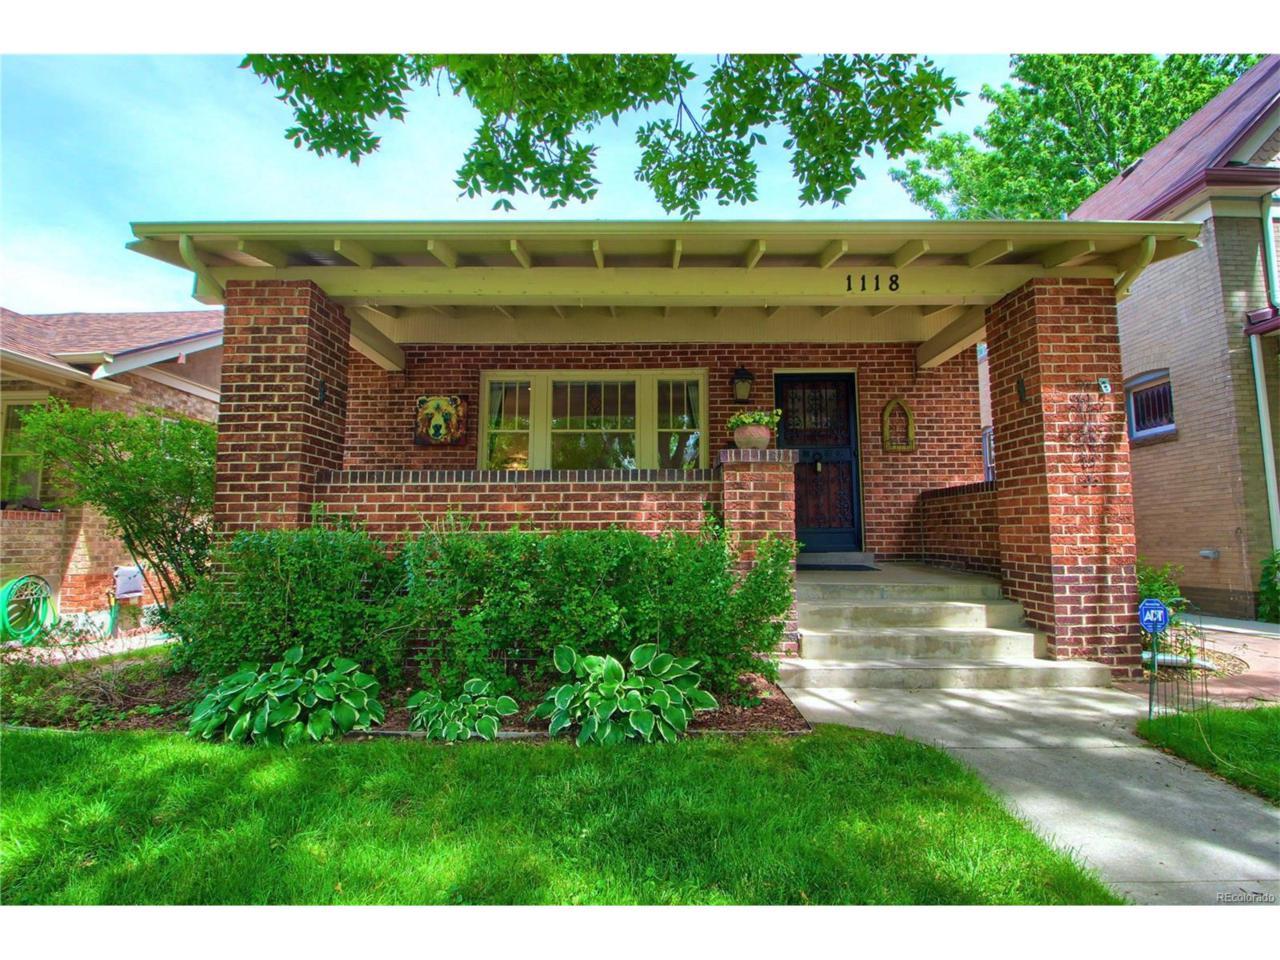 1118 Fillmore Street, Denver, CO 80206 (MLS #9490887) :: 8z Real Estate